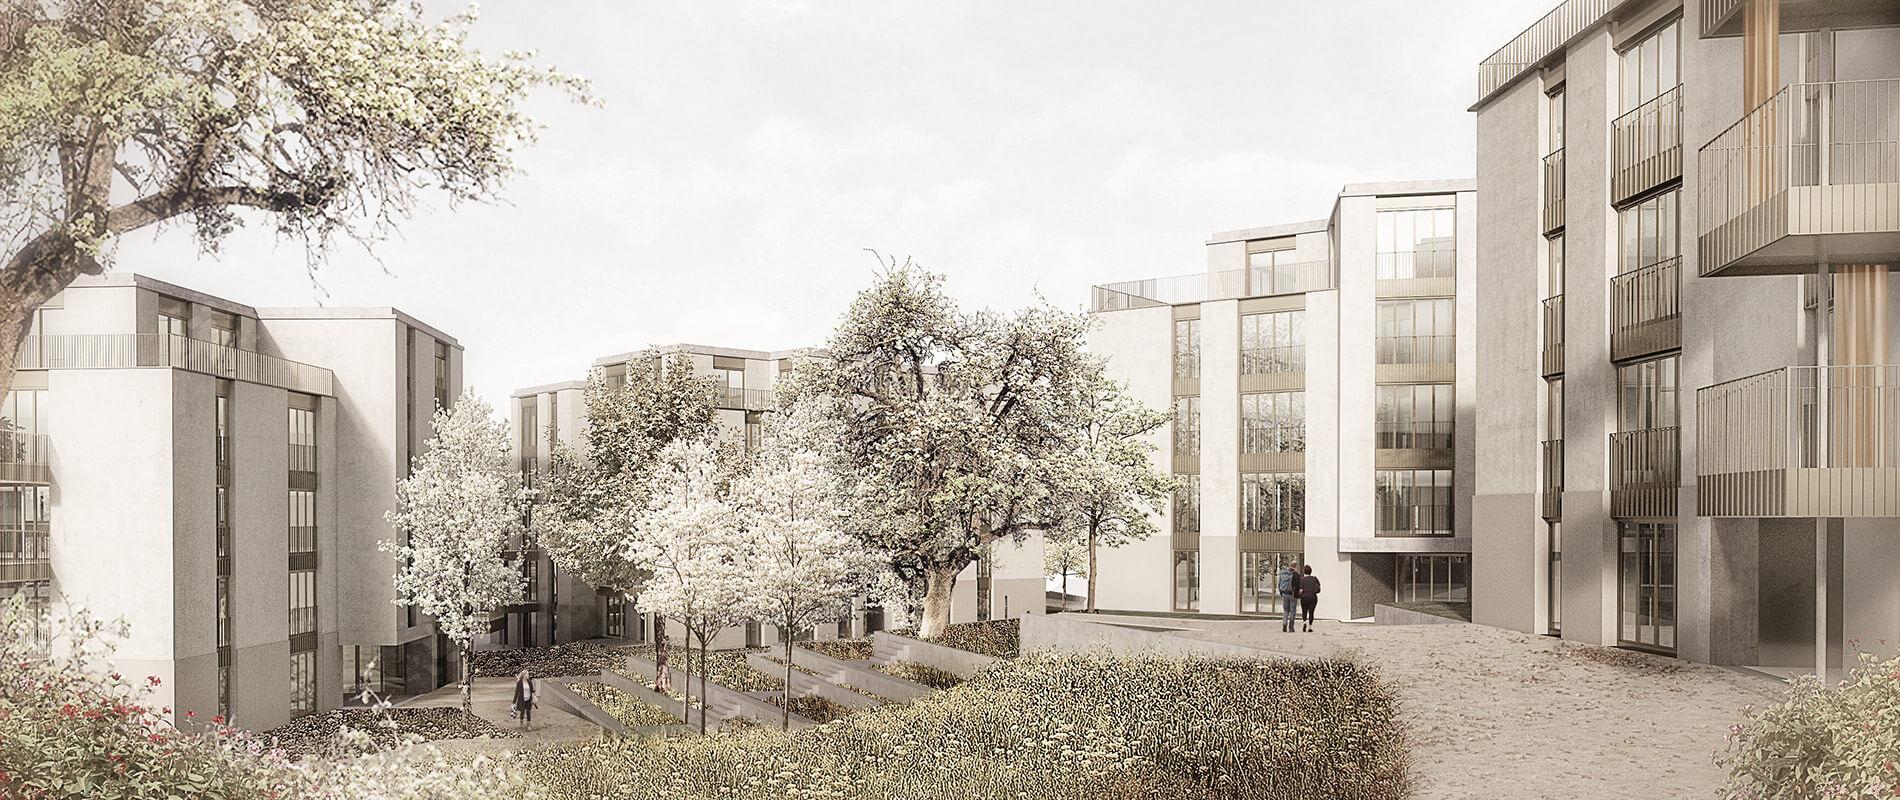 Studienauftrag Trichtenhausenstrasse |Referenz | Ettinger Partner